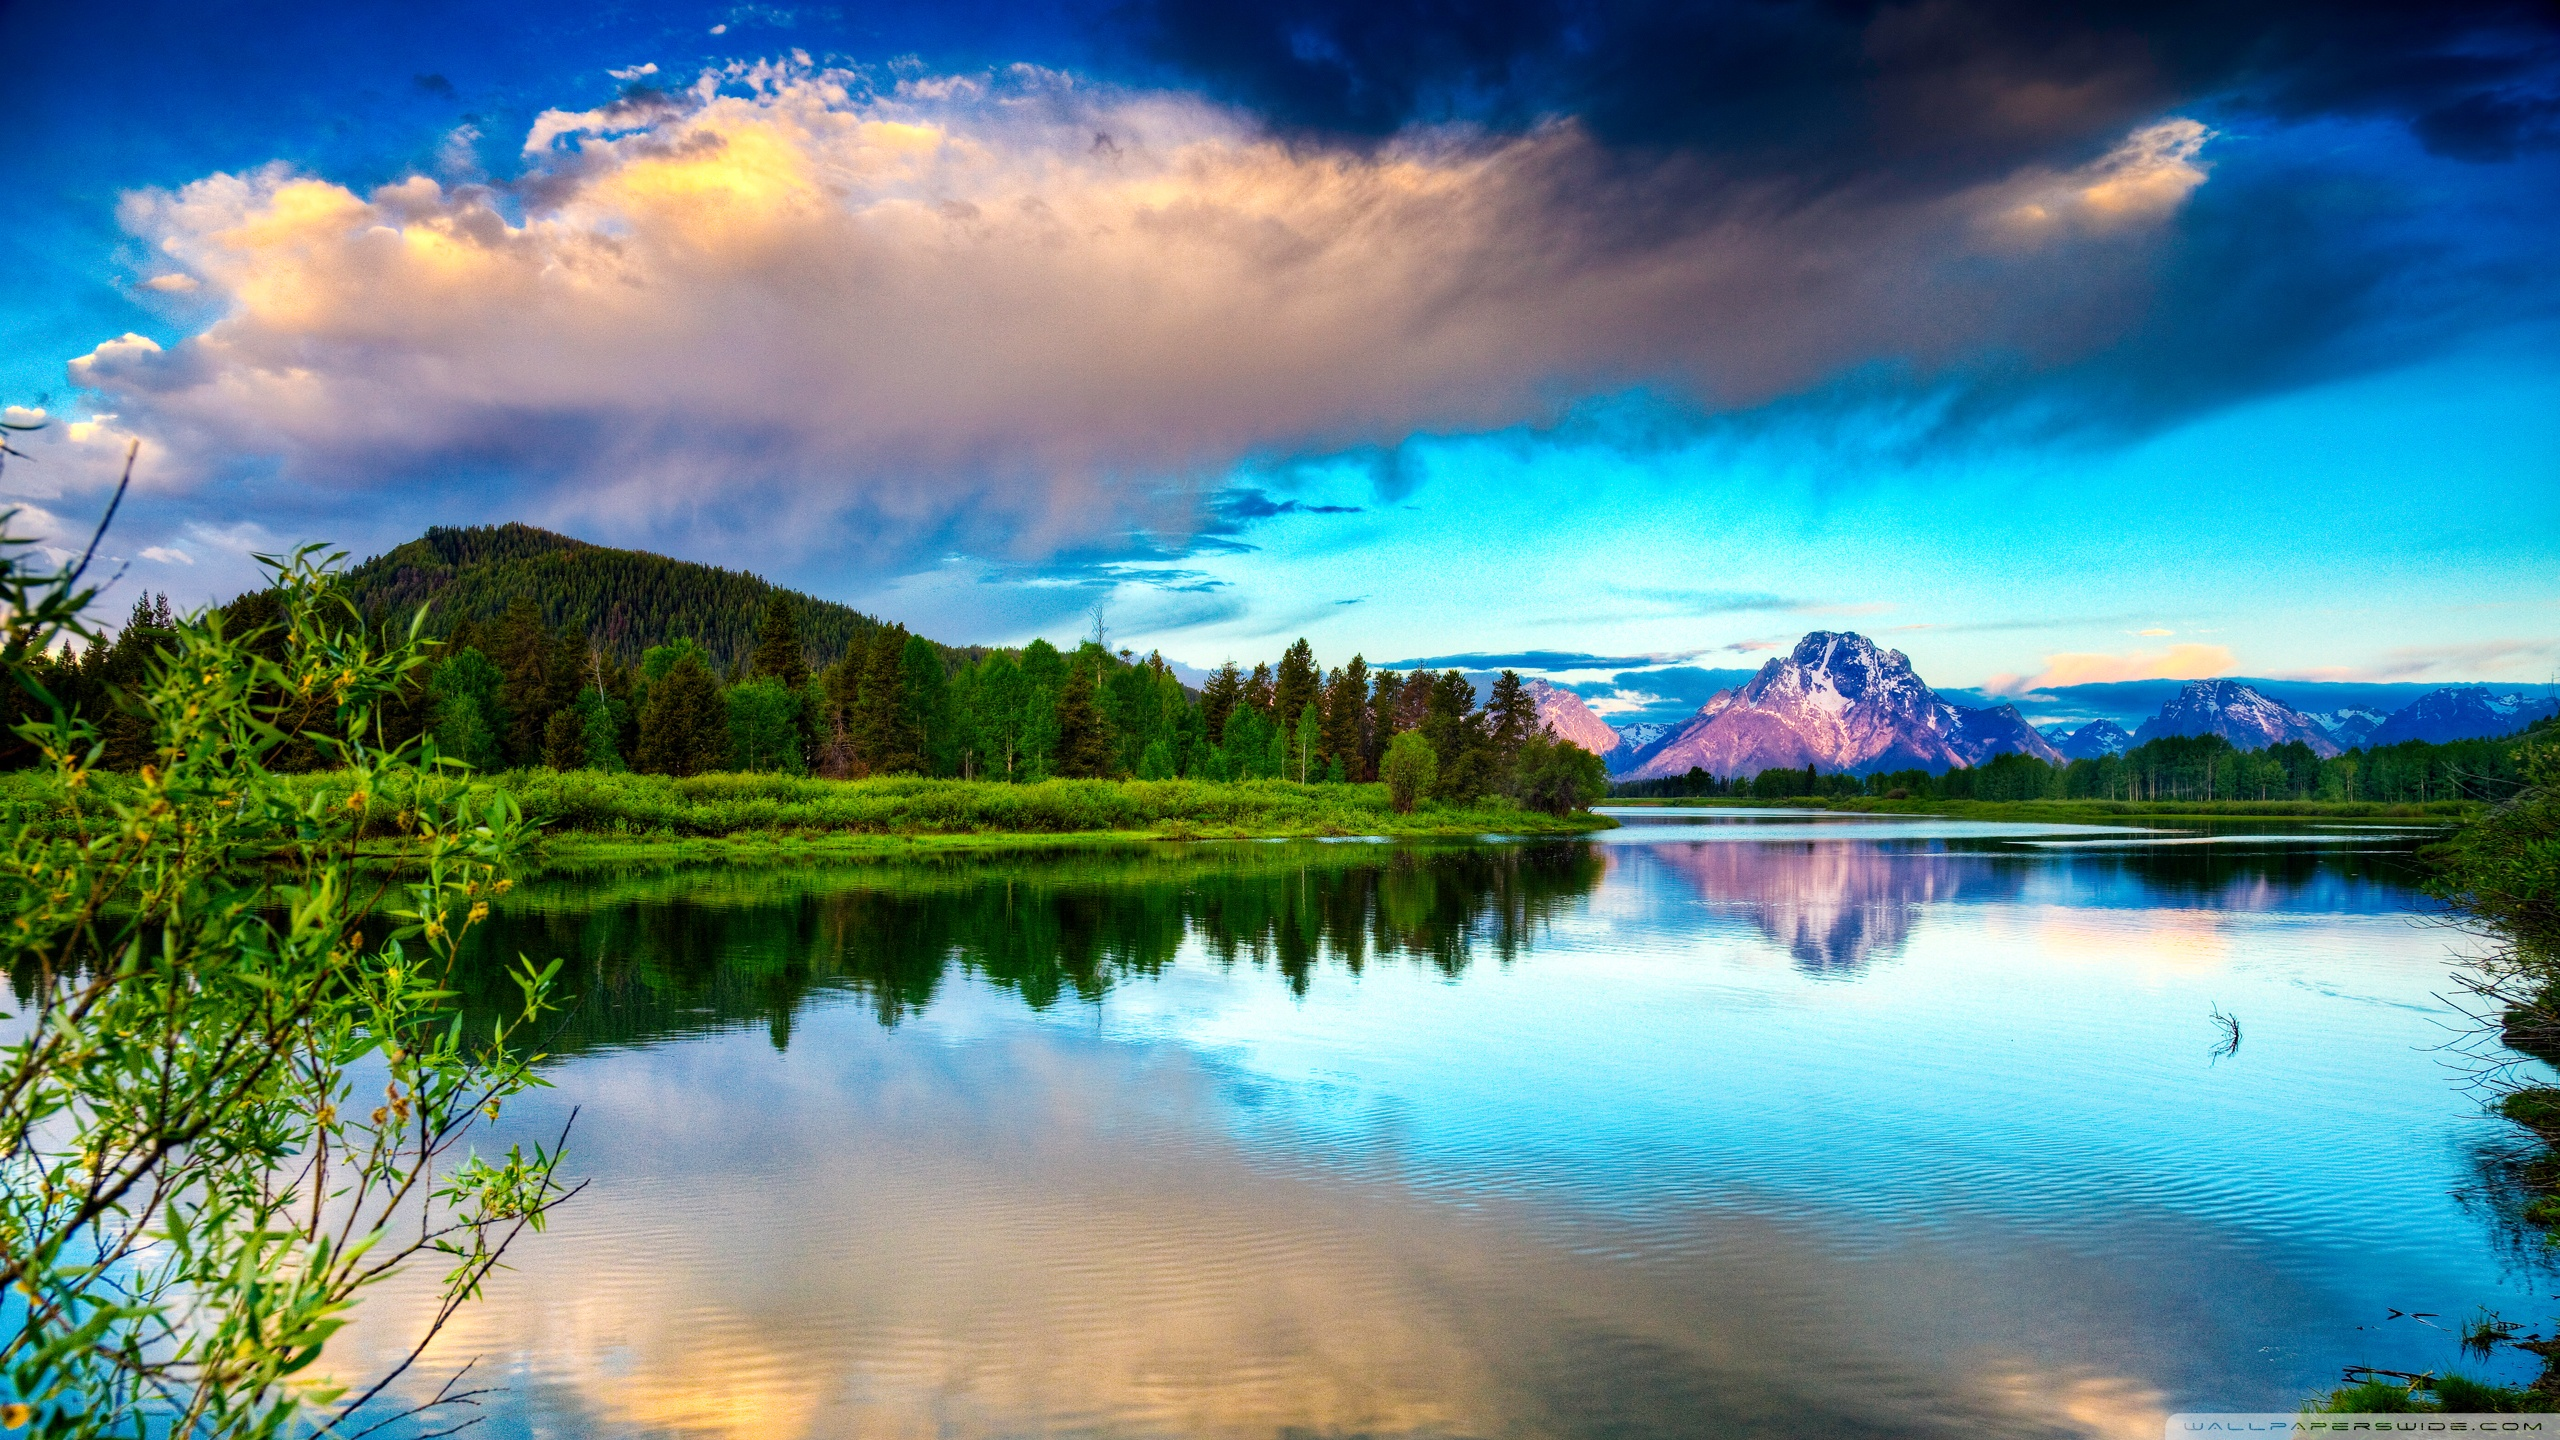 Landscape Oil Painting Nature 2560x1440 Wallpaper Teahub Io